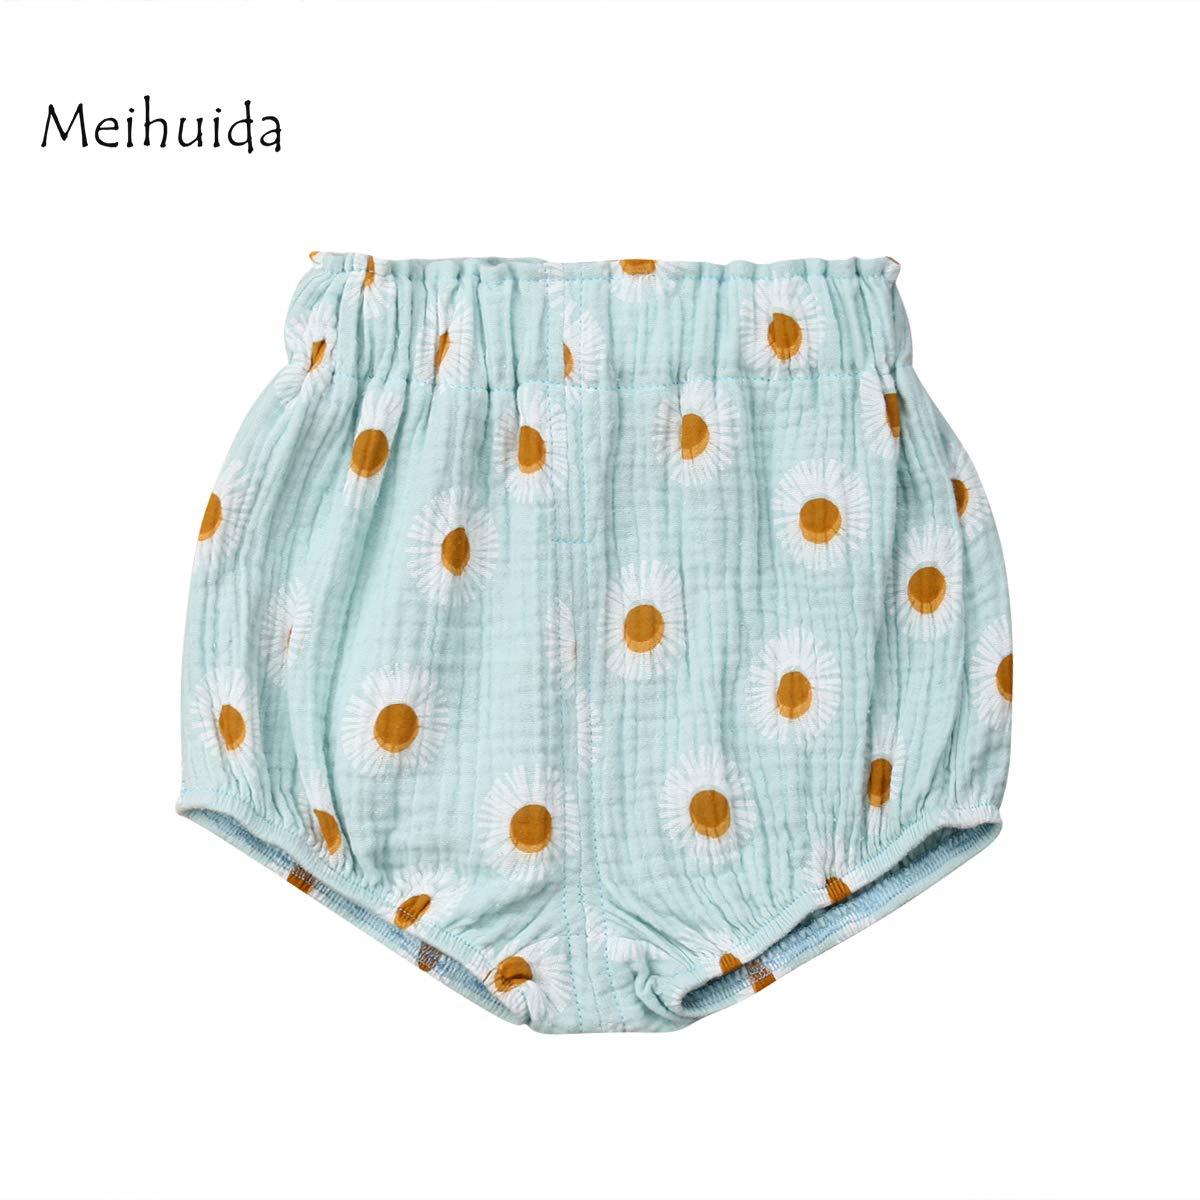 Arilove Newborn Infant Baby Girls Boys Cotton Linen Blend Pants Shorts Bottoms Bloomer Shorts